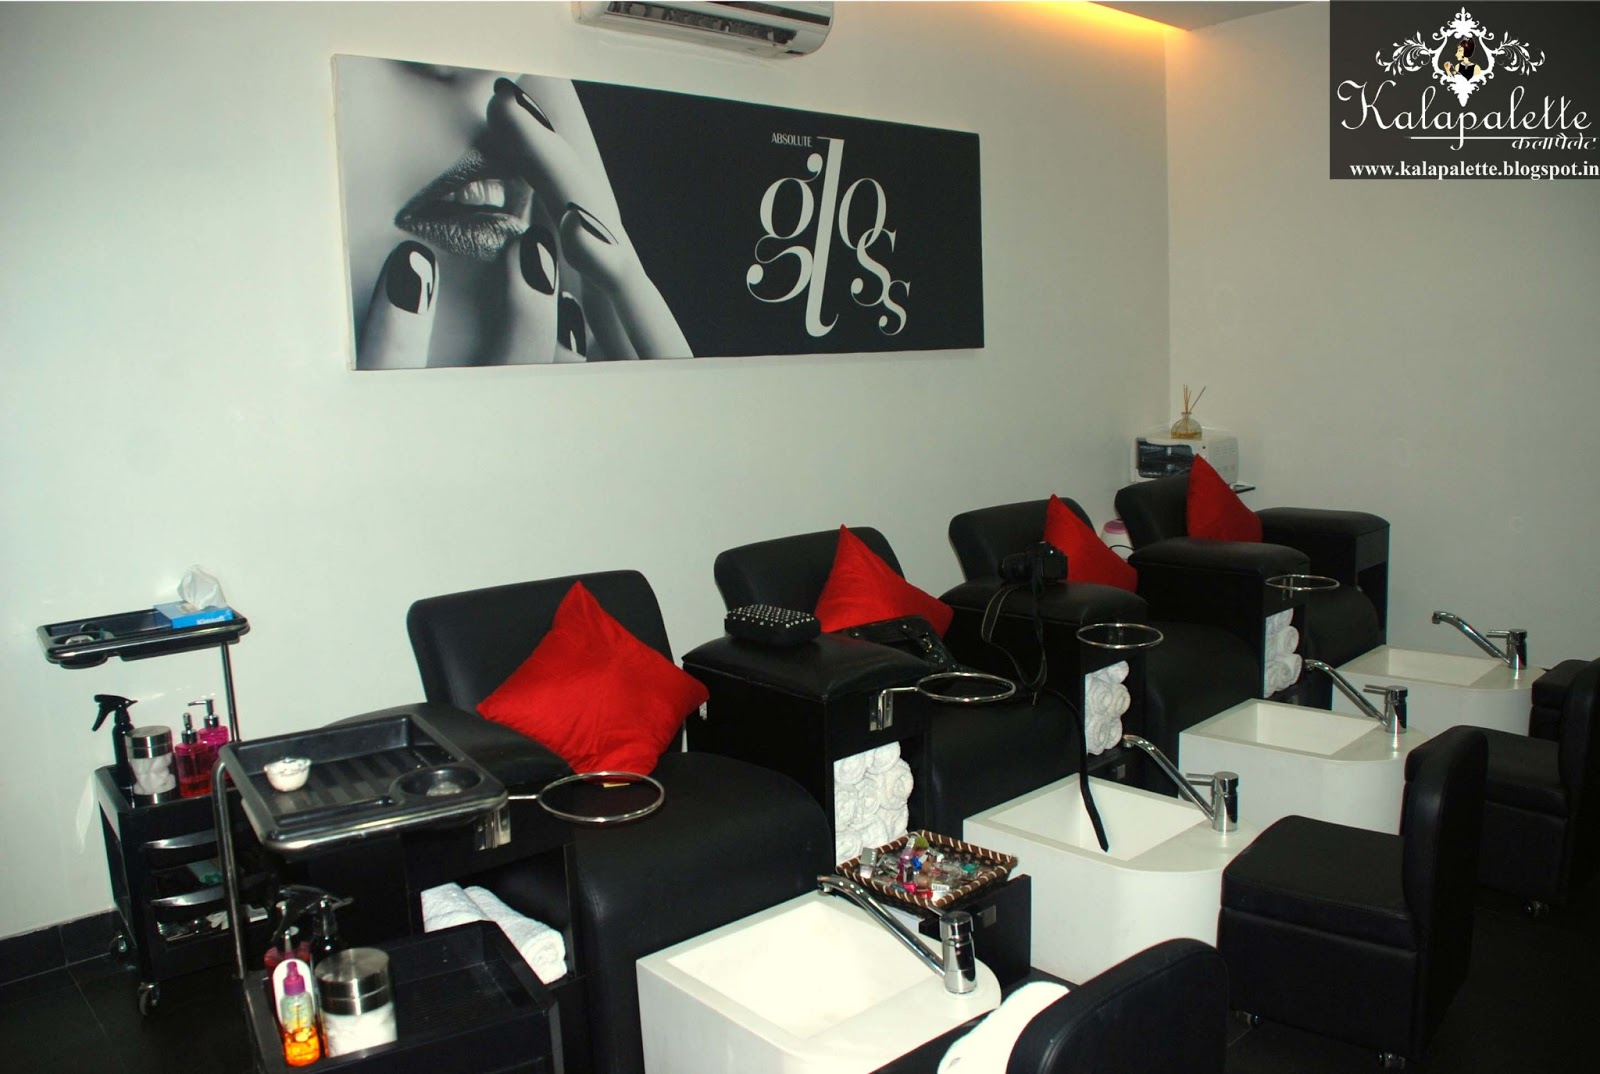 Hair salon styling stations 2013 joy studio design for Absolute beauty salon